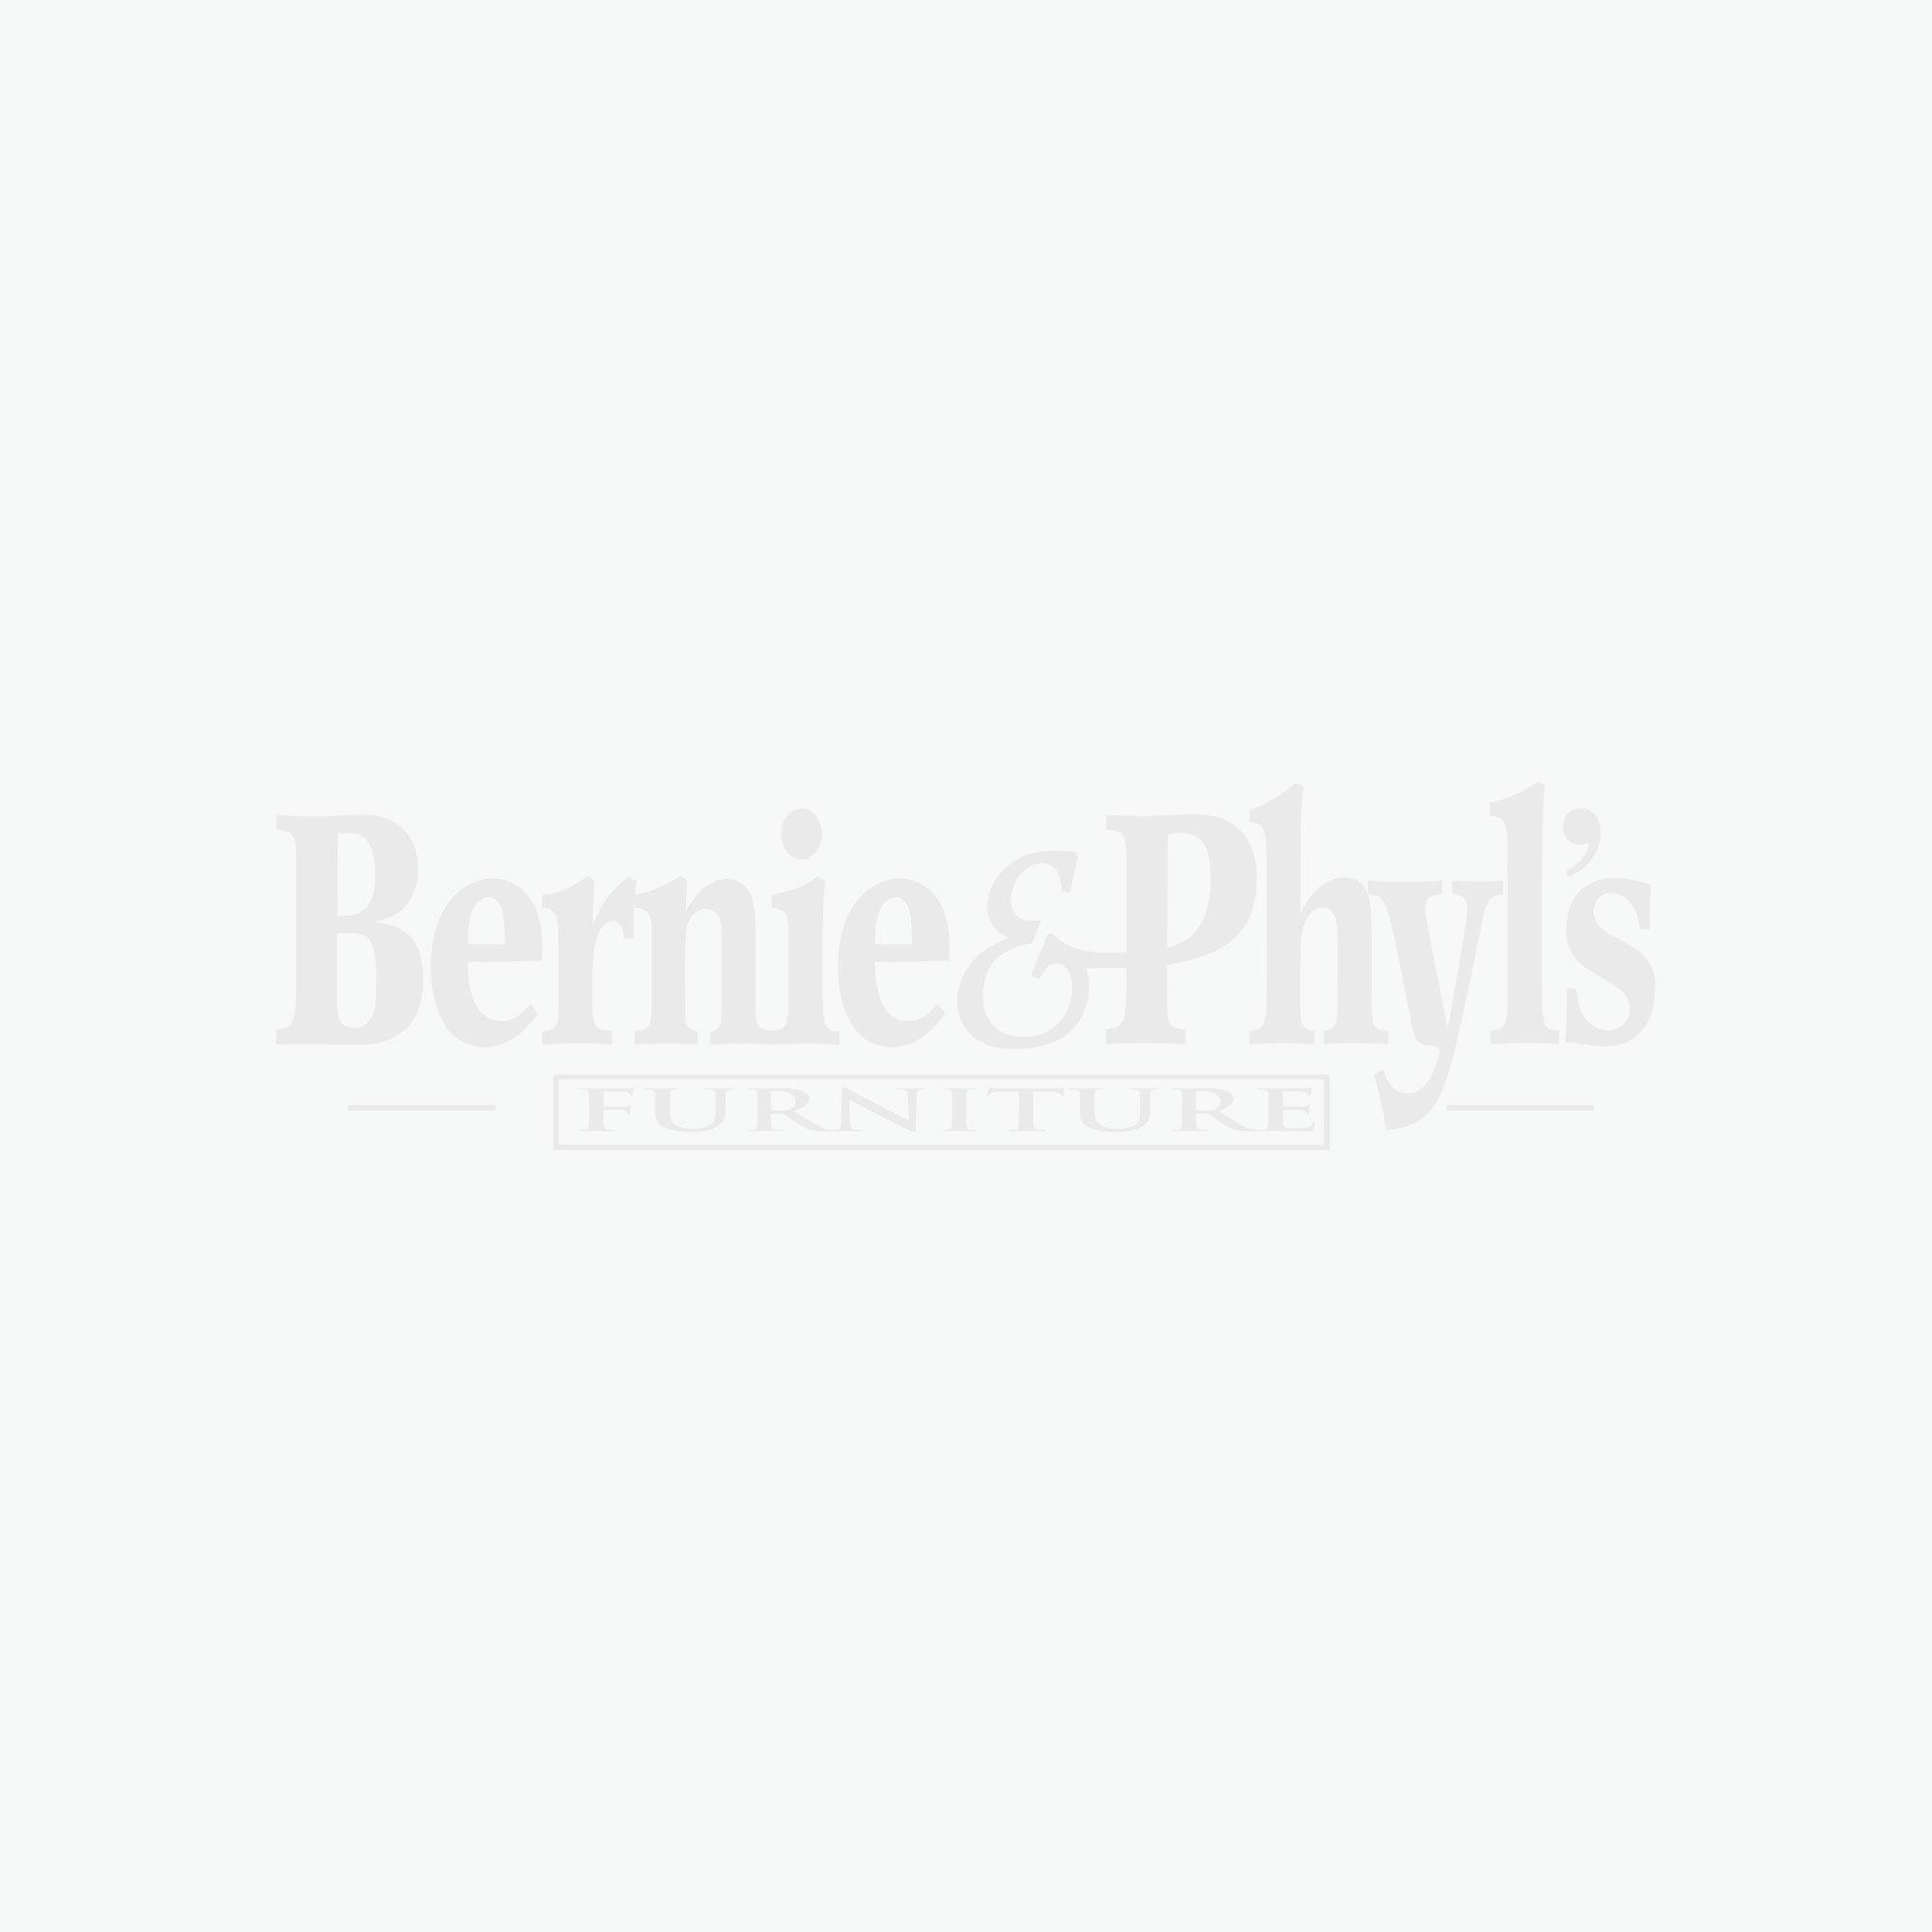 Queen Dritek Mattress Pad Bernie & Phyl's Furniture by